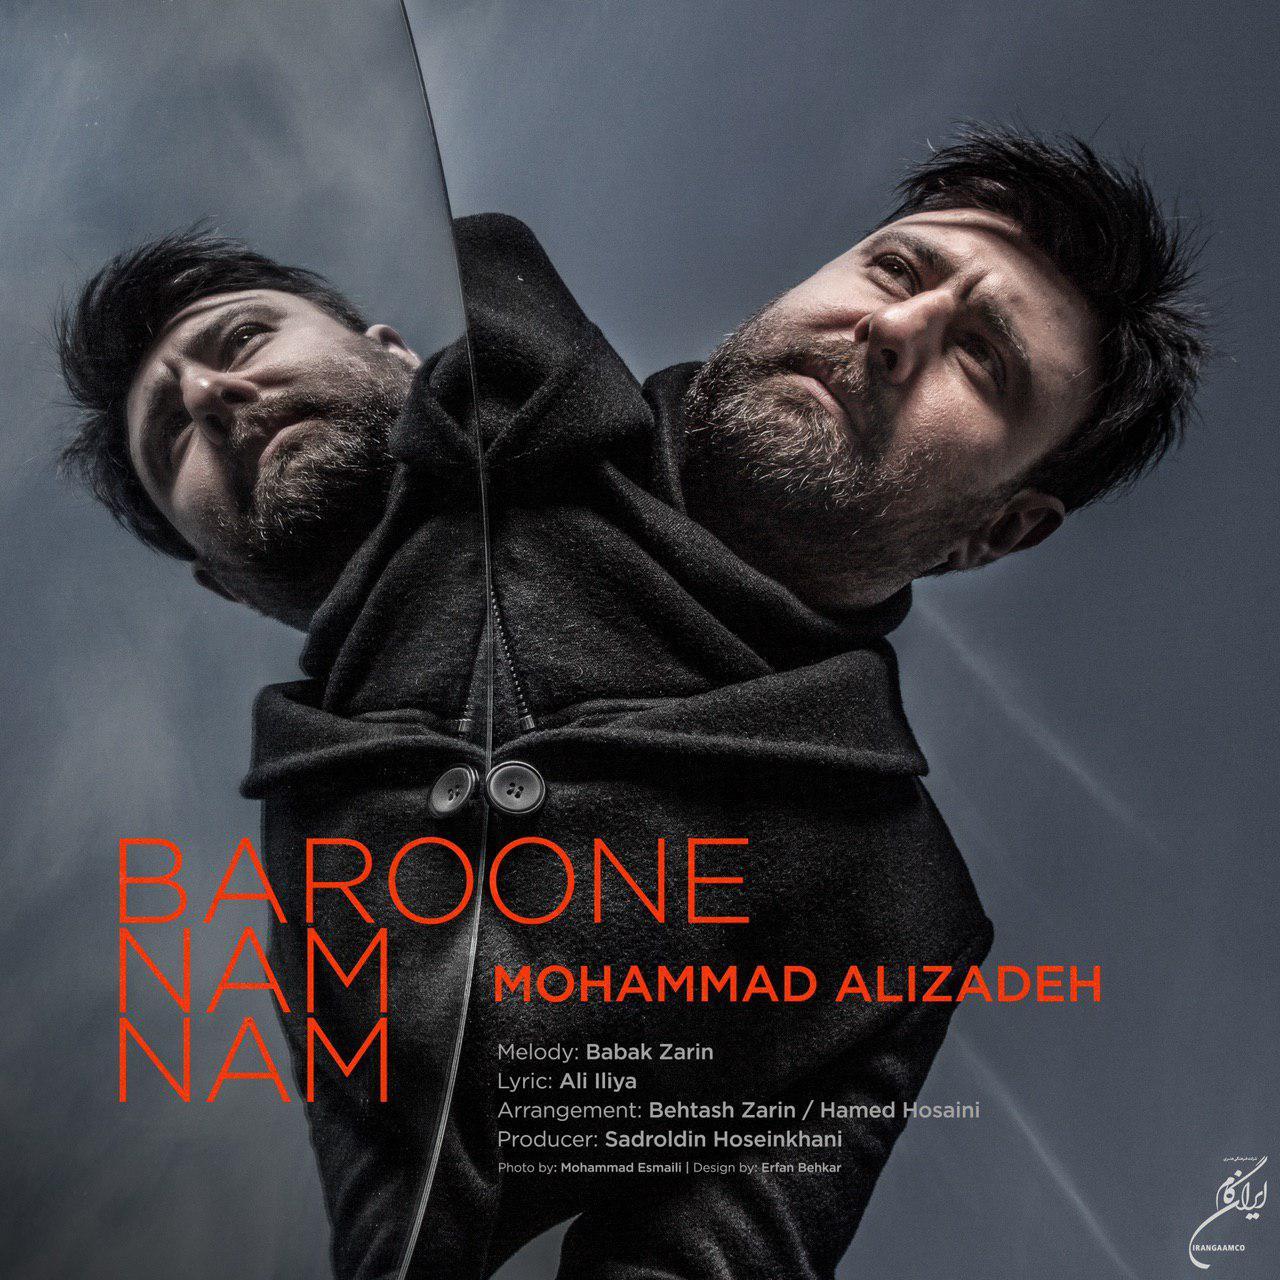 Mohammad Alizadeh – Baroon Nam Nam